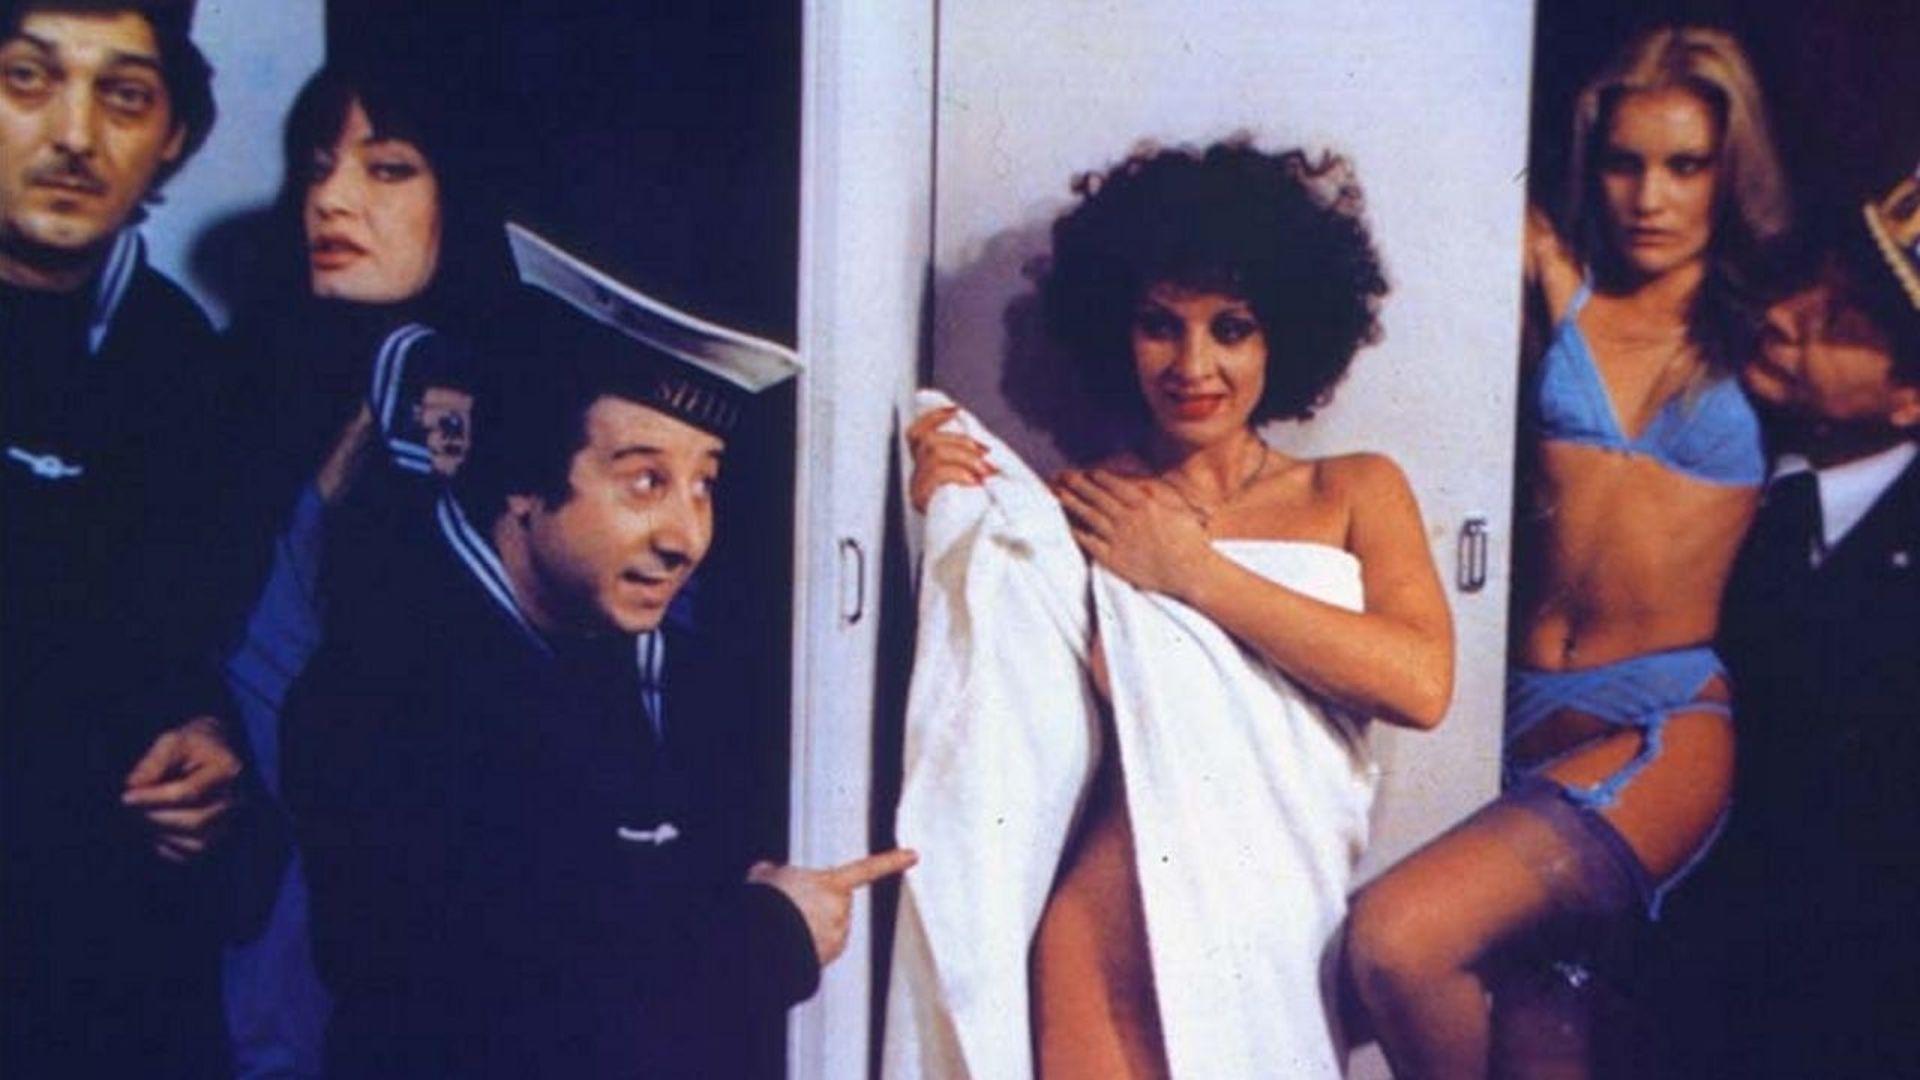 Paola Senatore the doctor prefers sailors (1981) - where to watch it